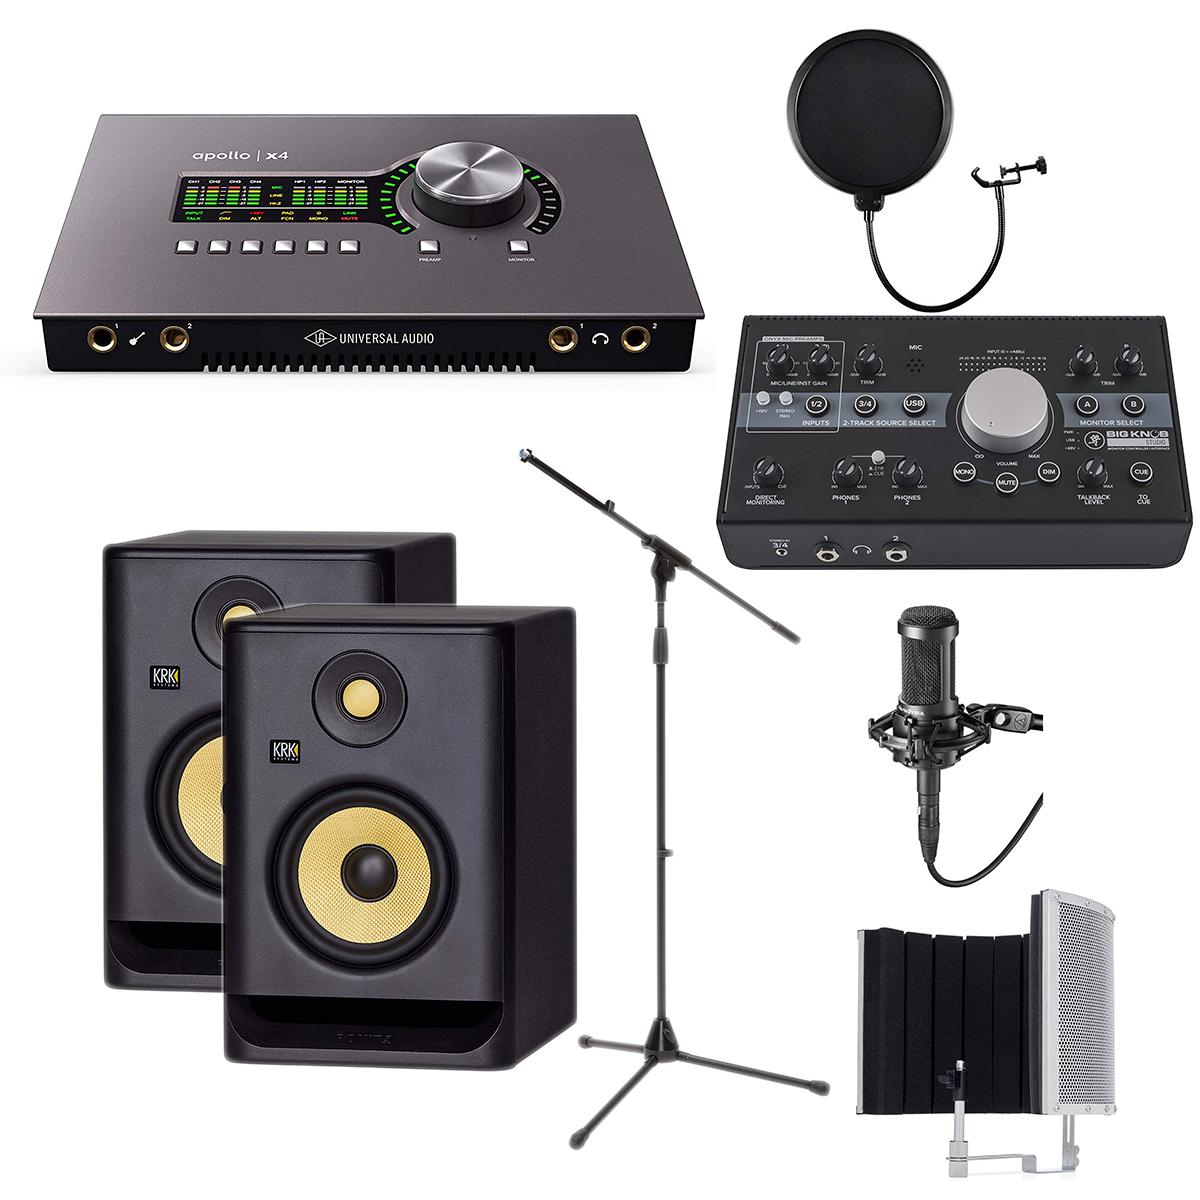 -3 Universal Audio Apollo x4 - Mackie Big Knob Monitor - KRK RP5G4 Pair - AT2035 - Mic Stand - Pop Filter - Marantz Filter - $1999.99